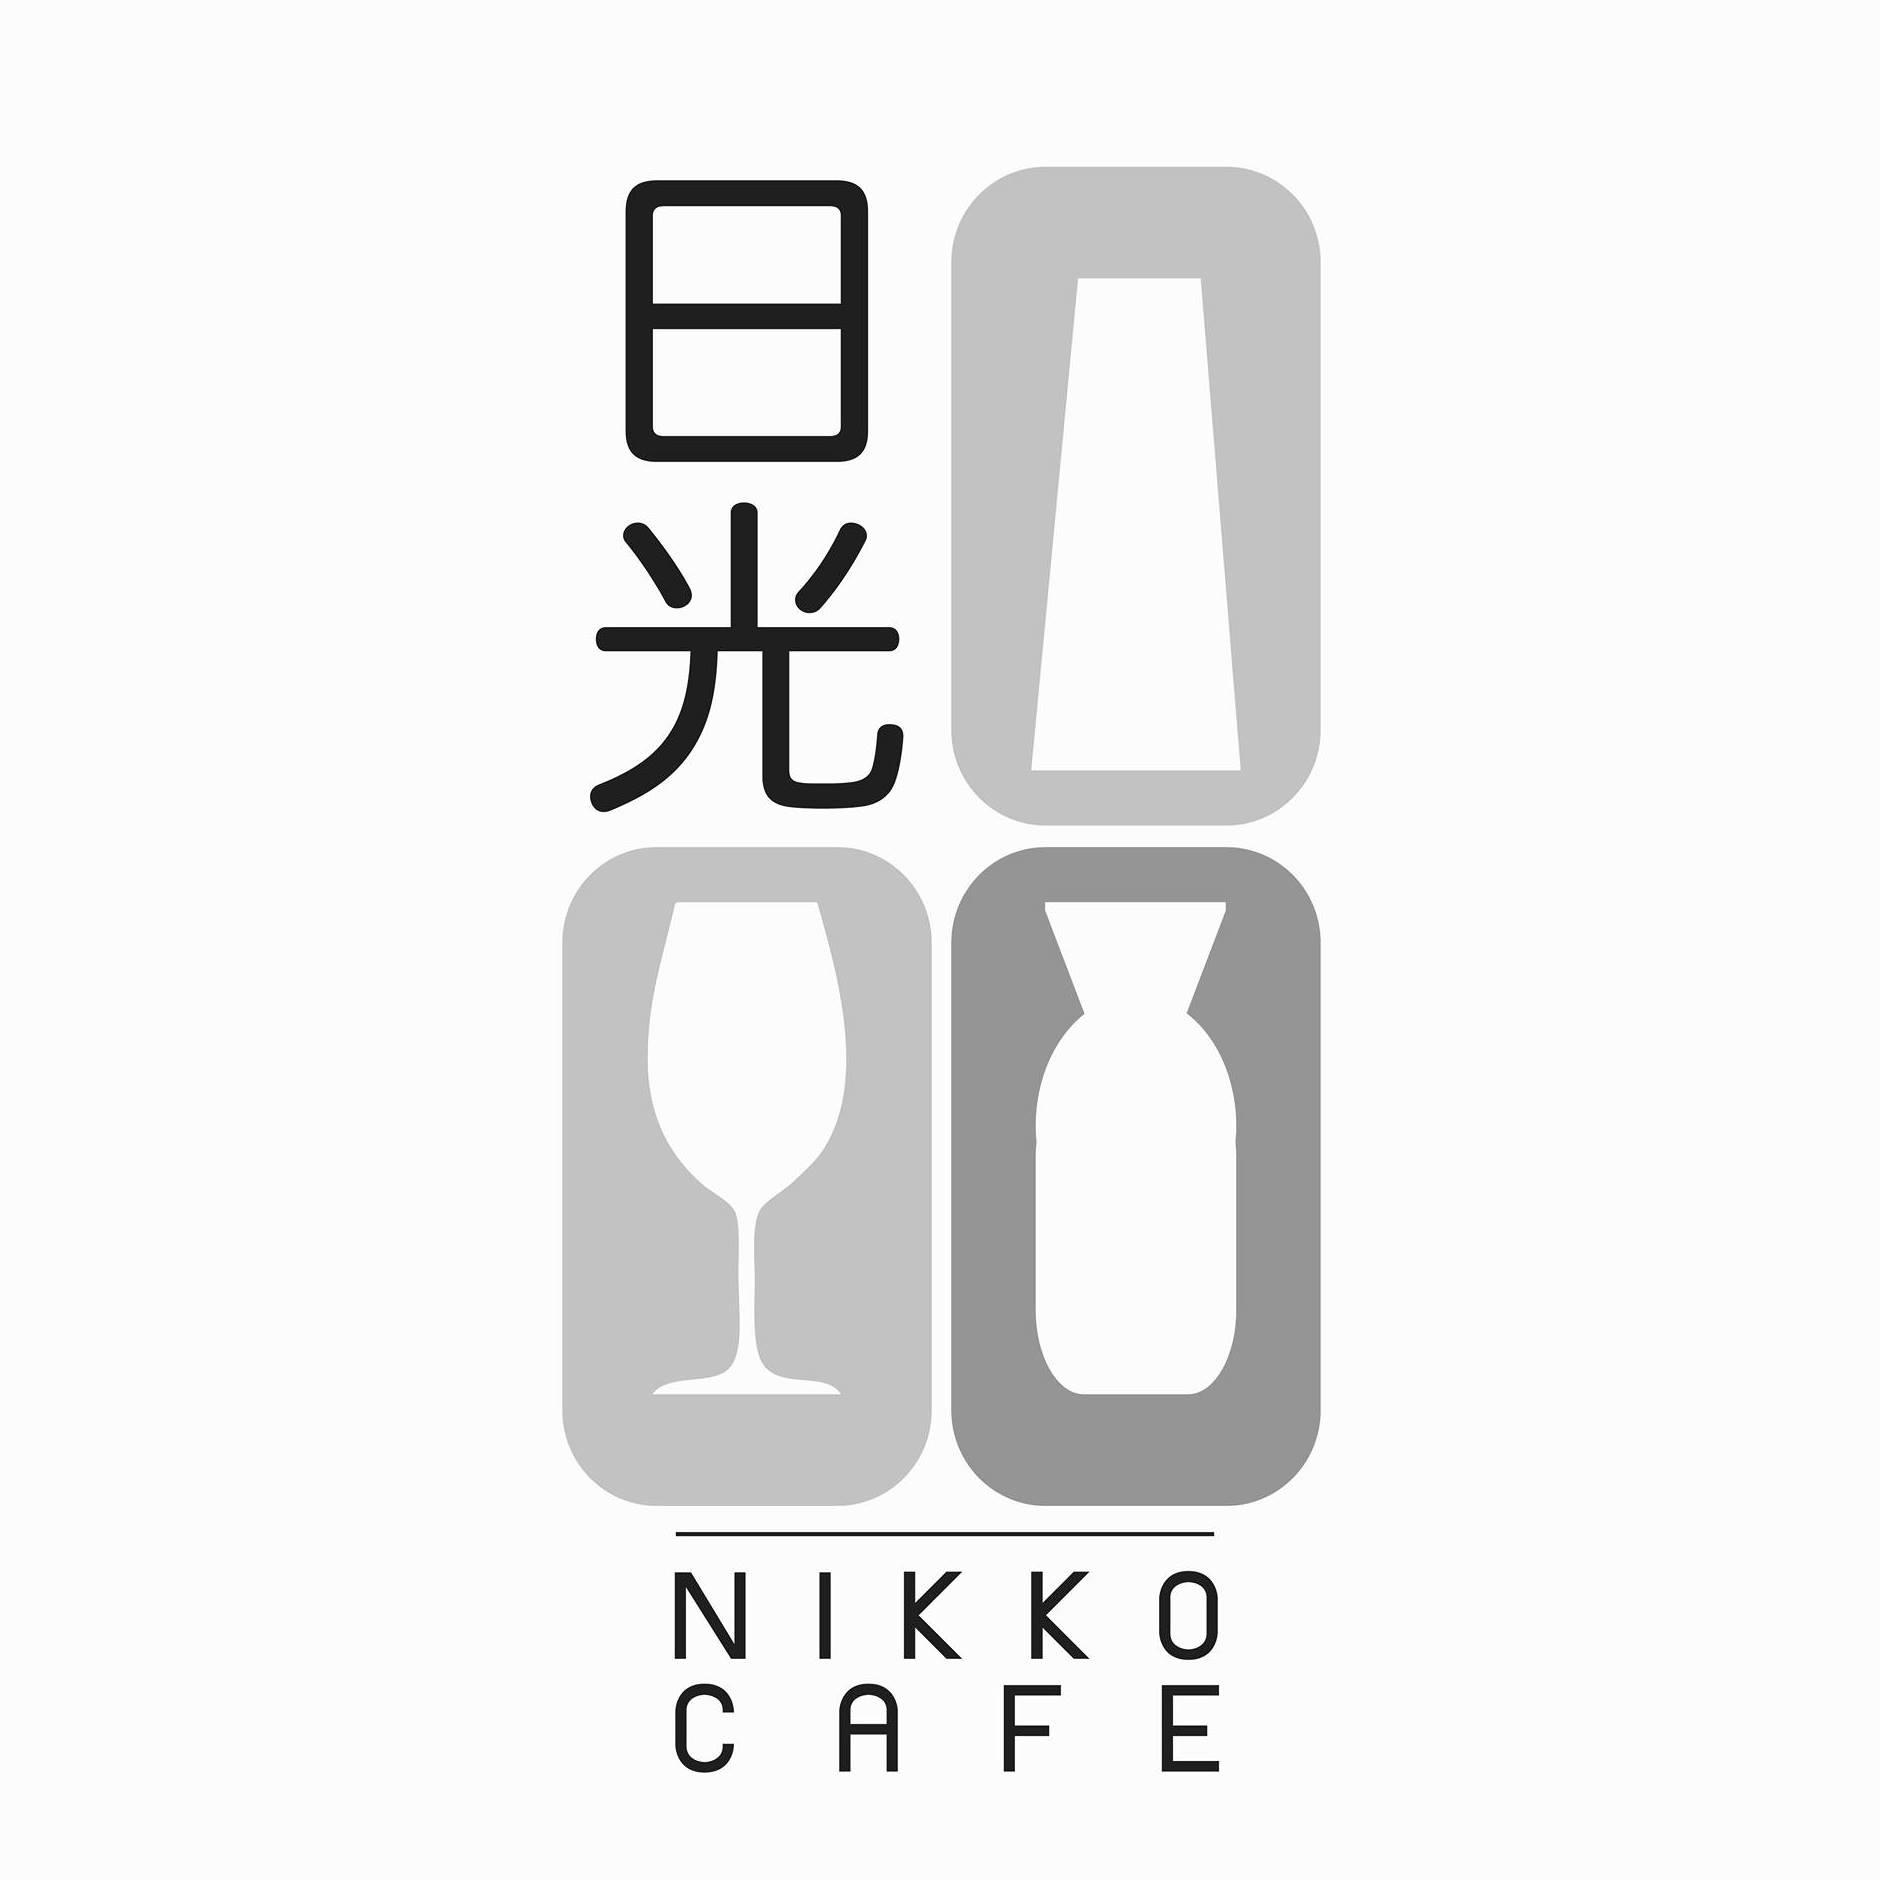 Nikko Cafe logo